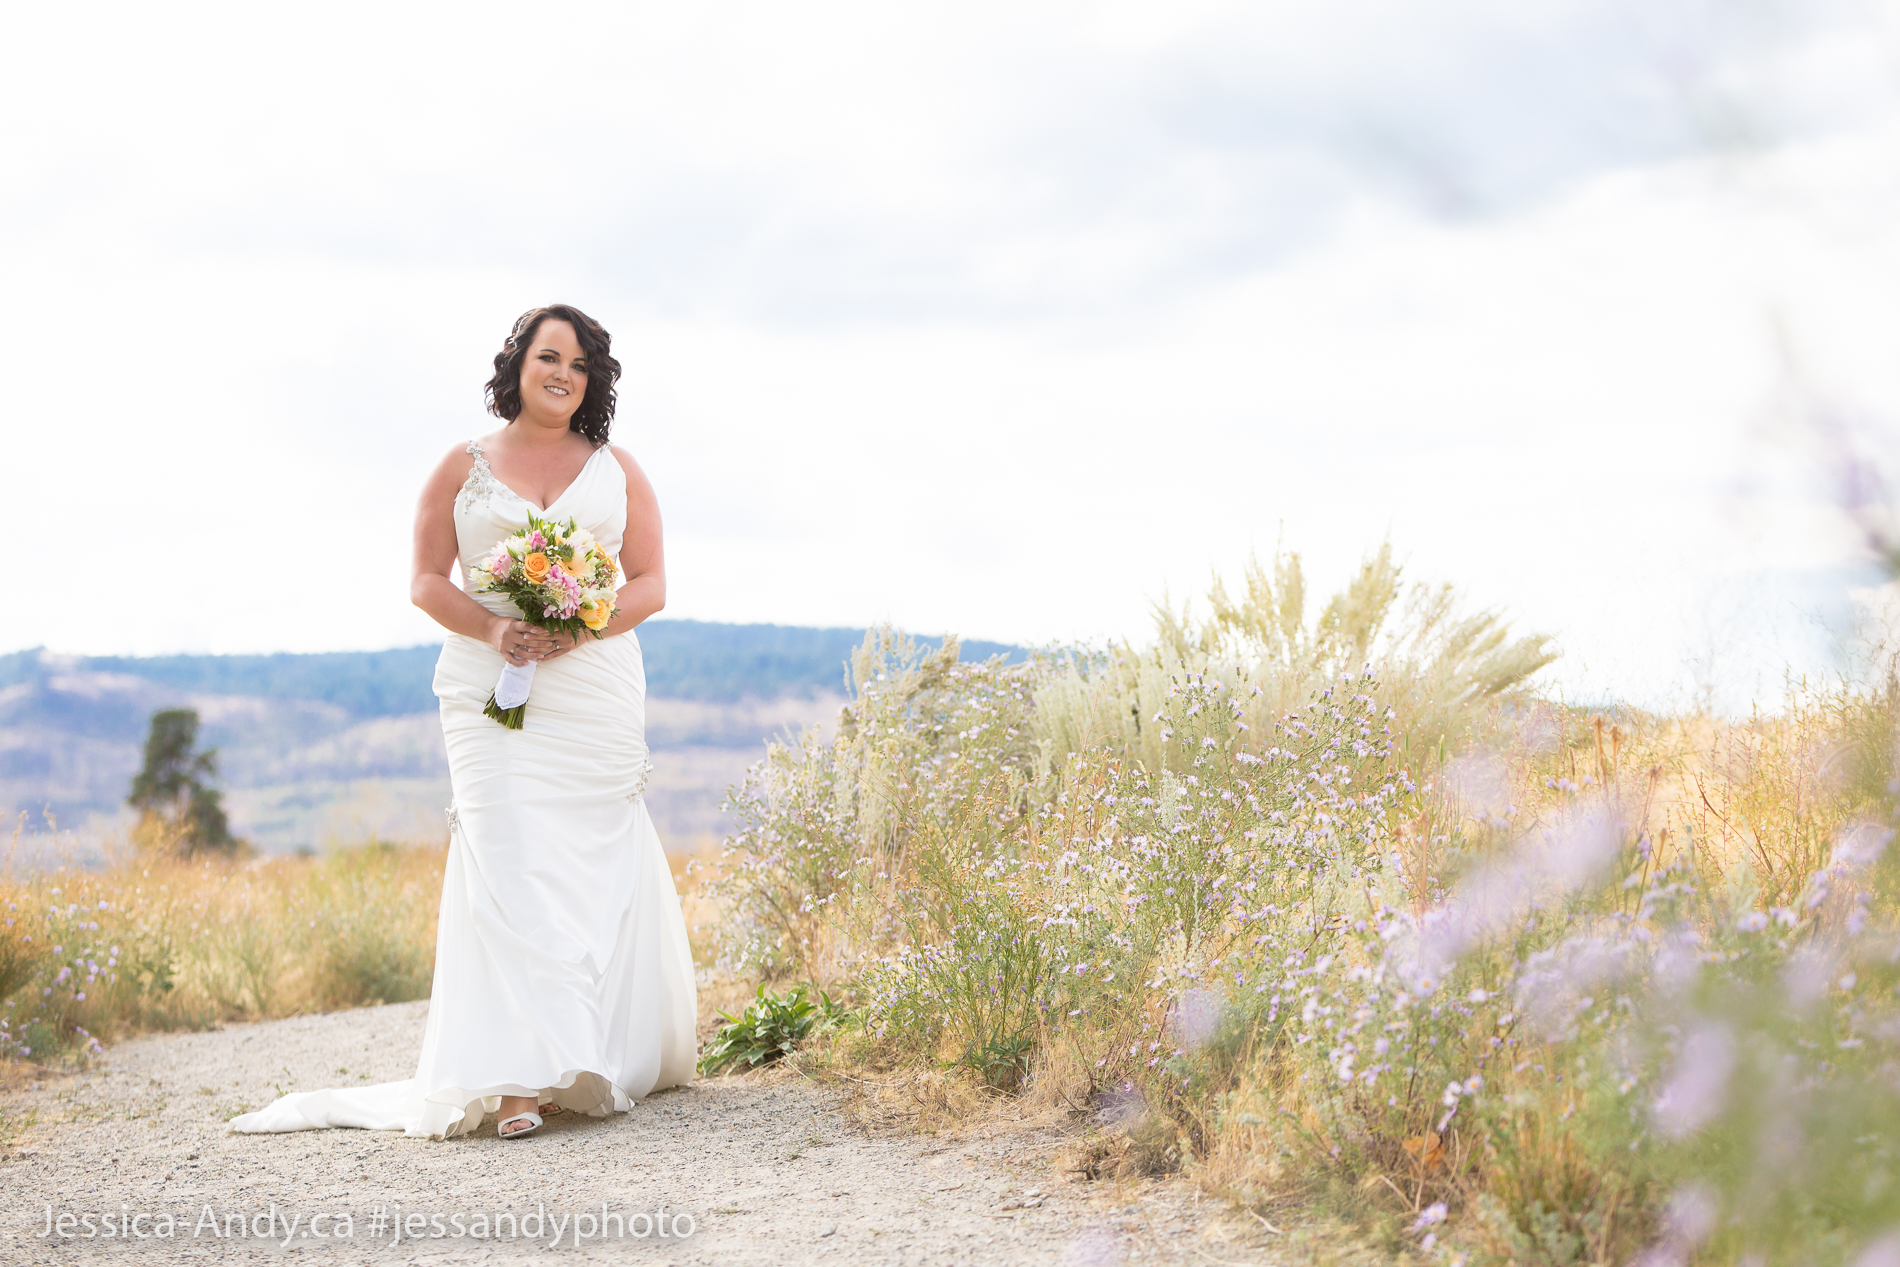 Kelowna Wedding - Bridal Walk